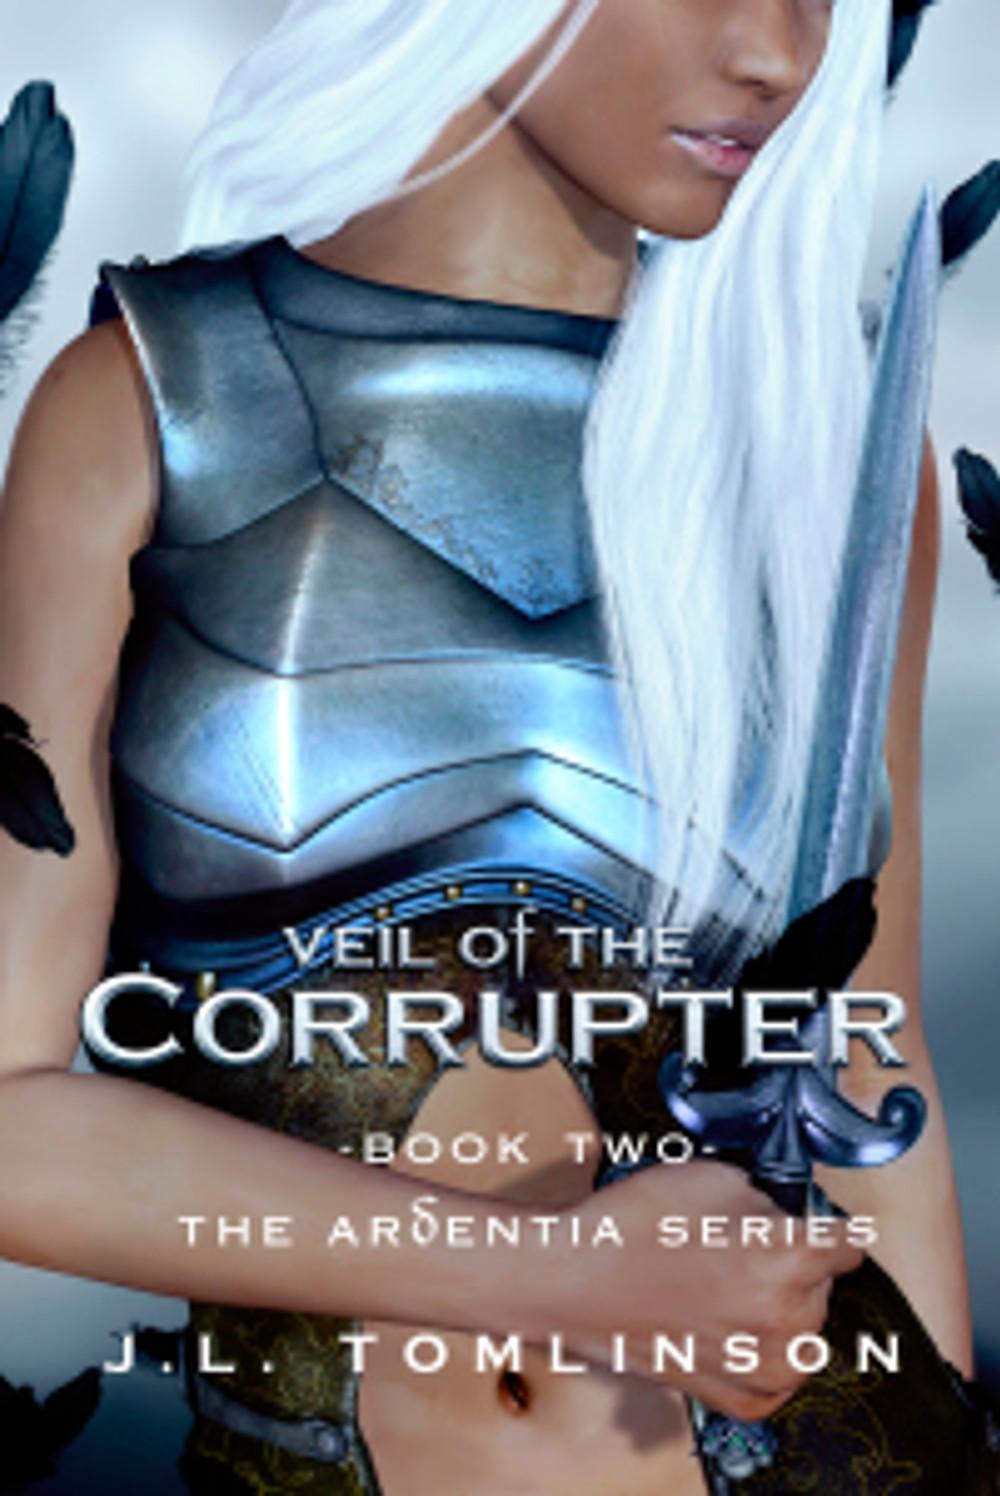 veil-of-the-corrupter_ebook_smashwords2016